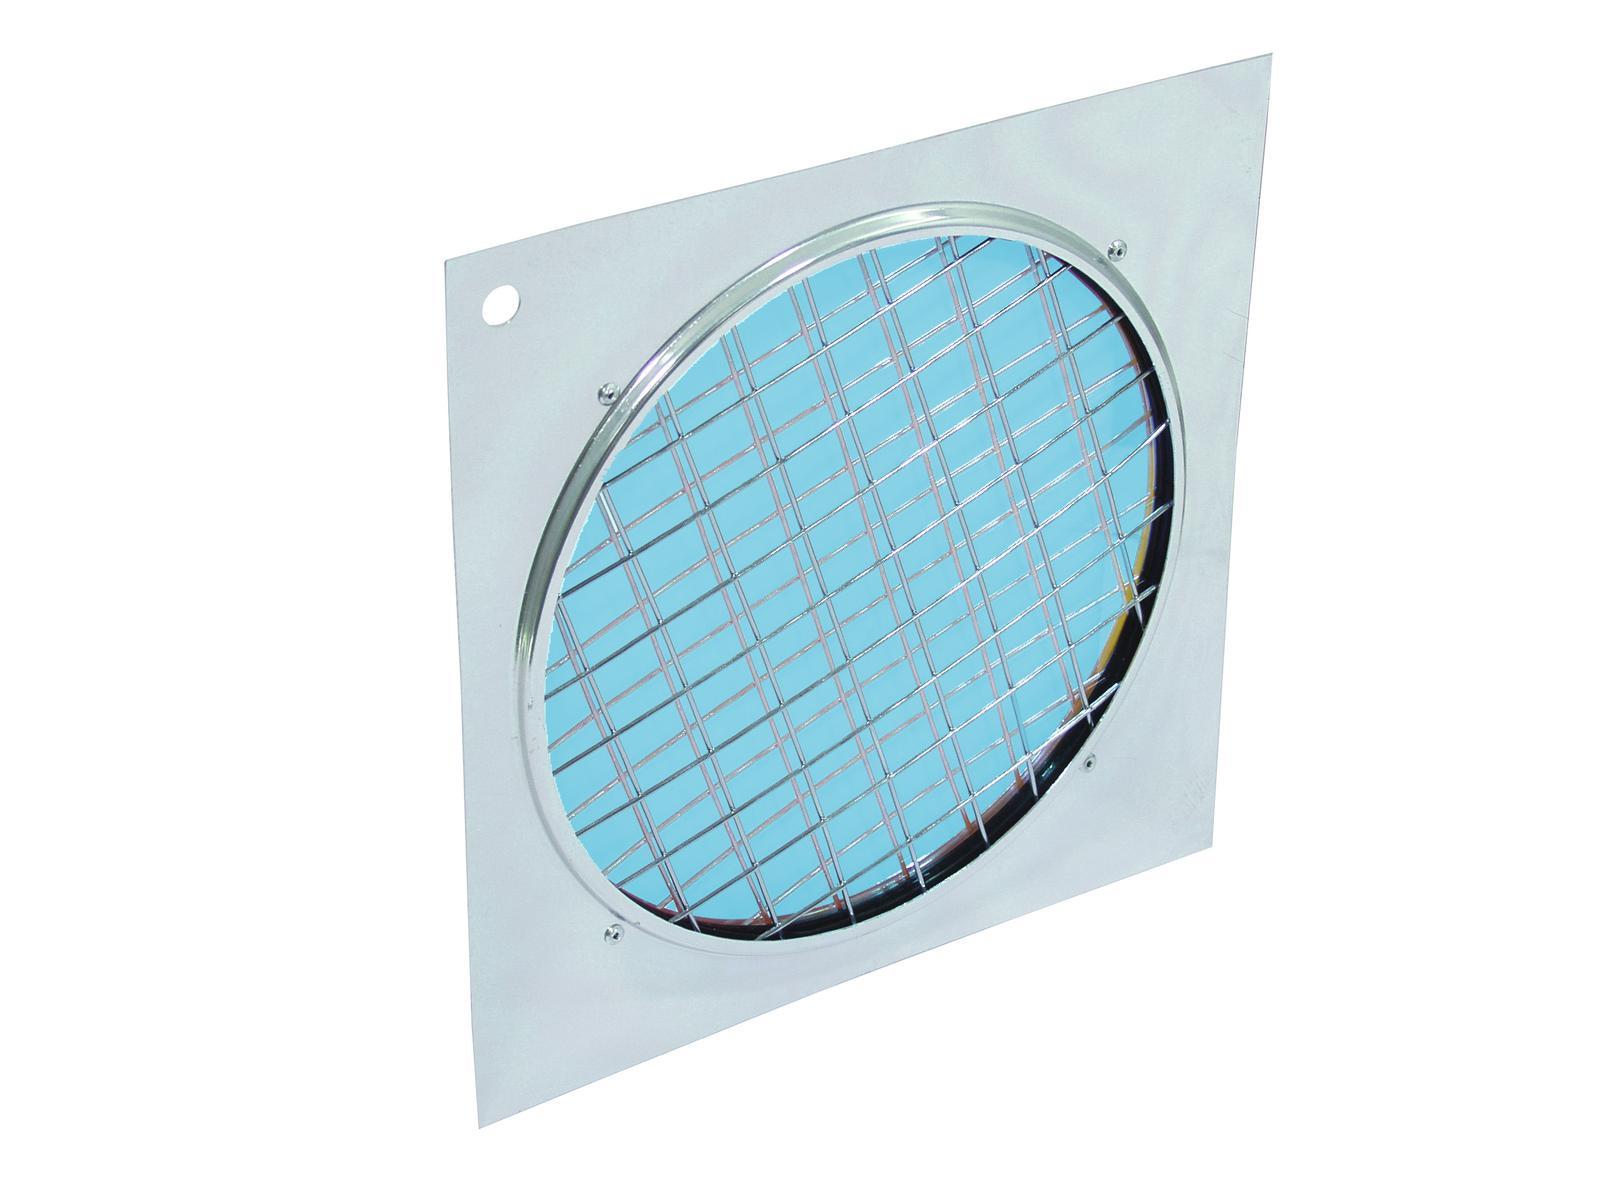 Filtro Frontale dicroico Per Faro Luce Par-64 blu con cornice argento Eurolite